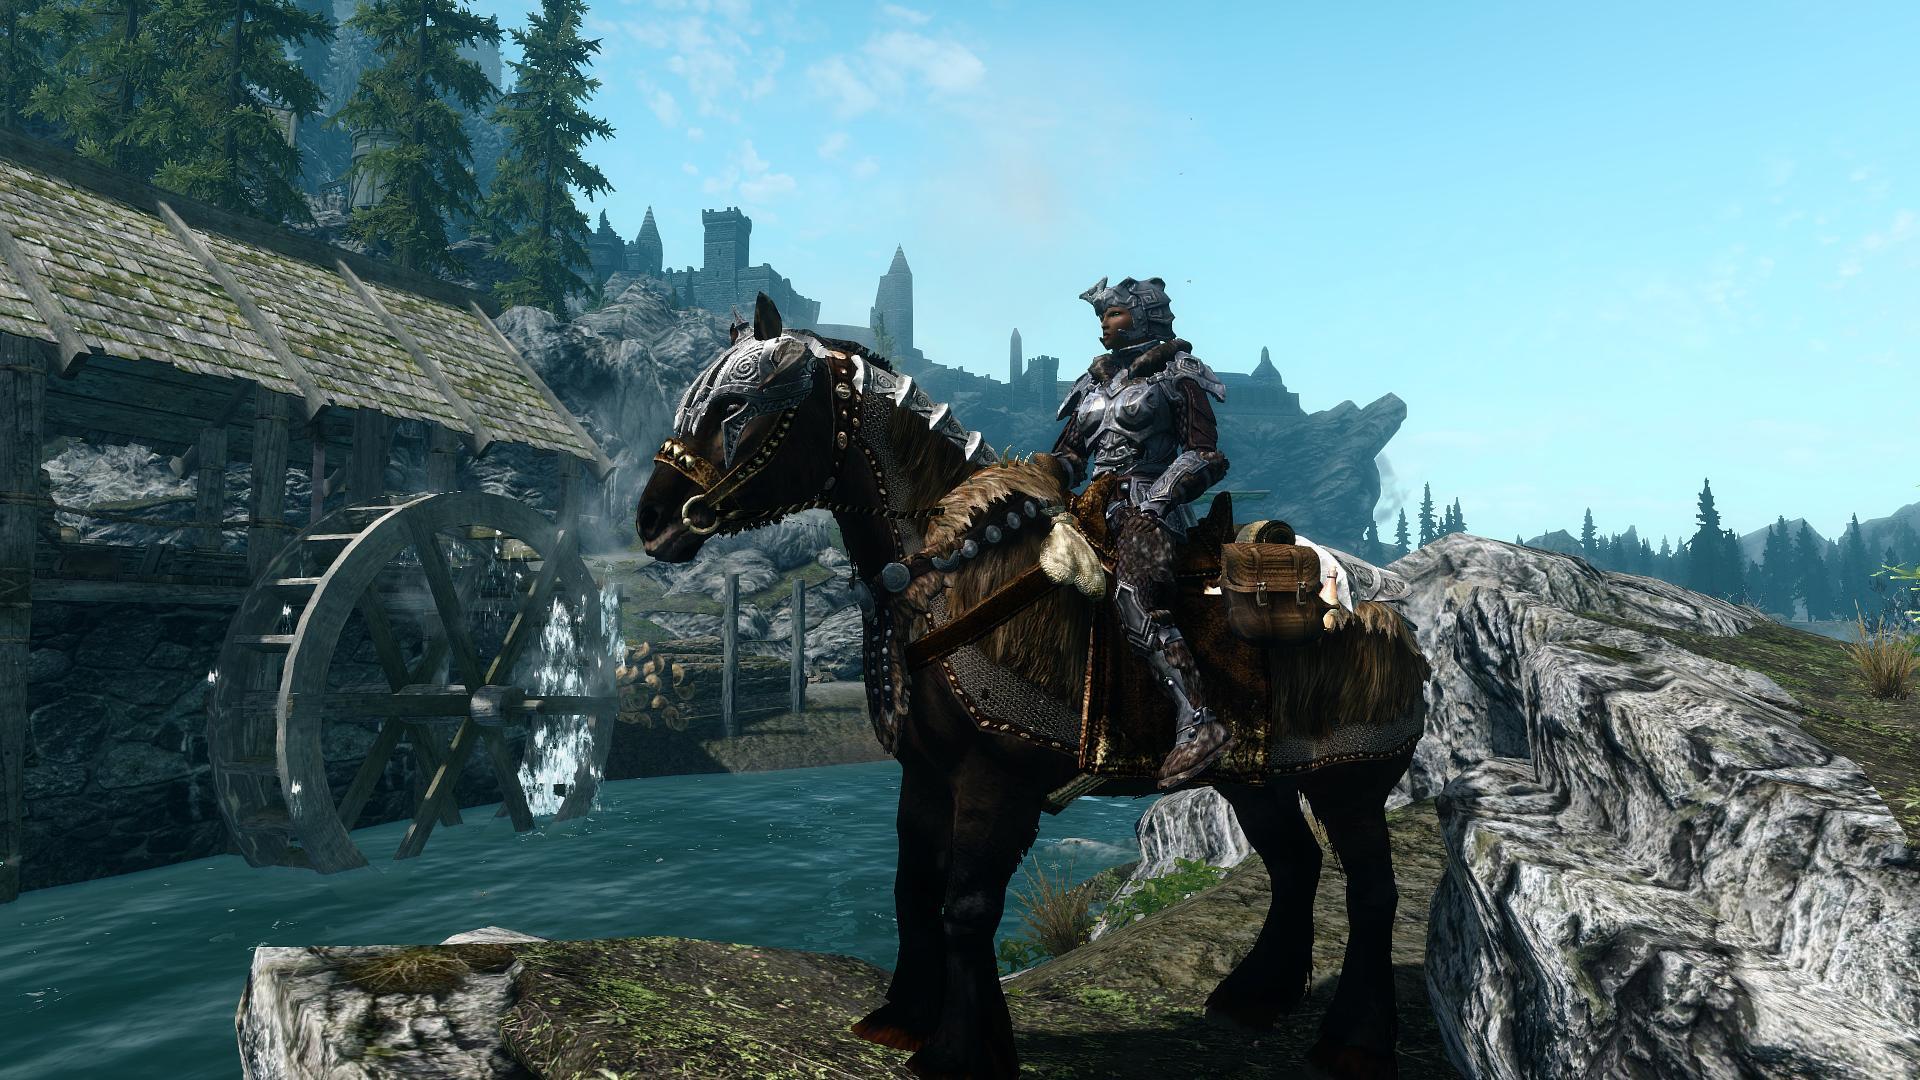 000226.Jpg - Elder Scrolls 5: Skyrim, the